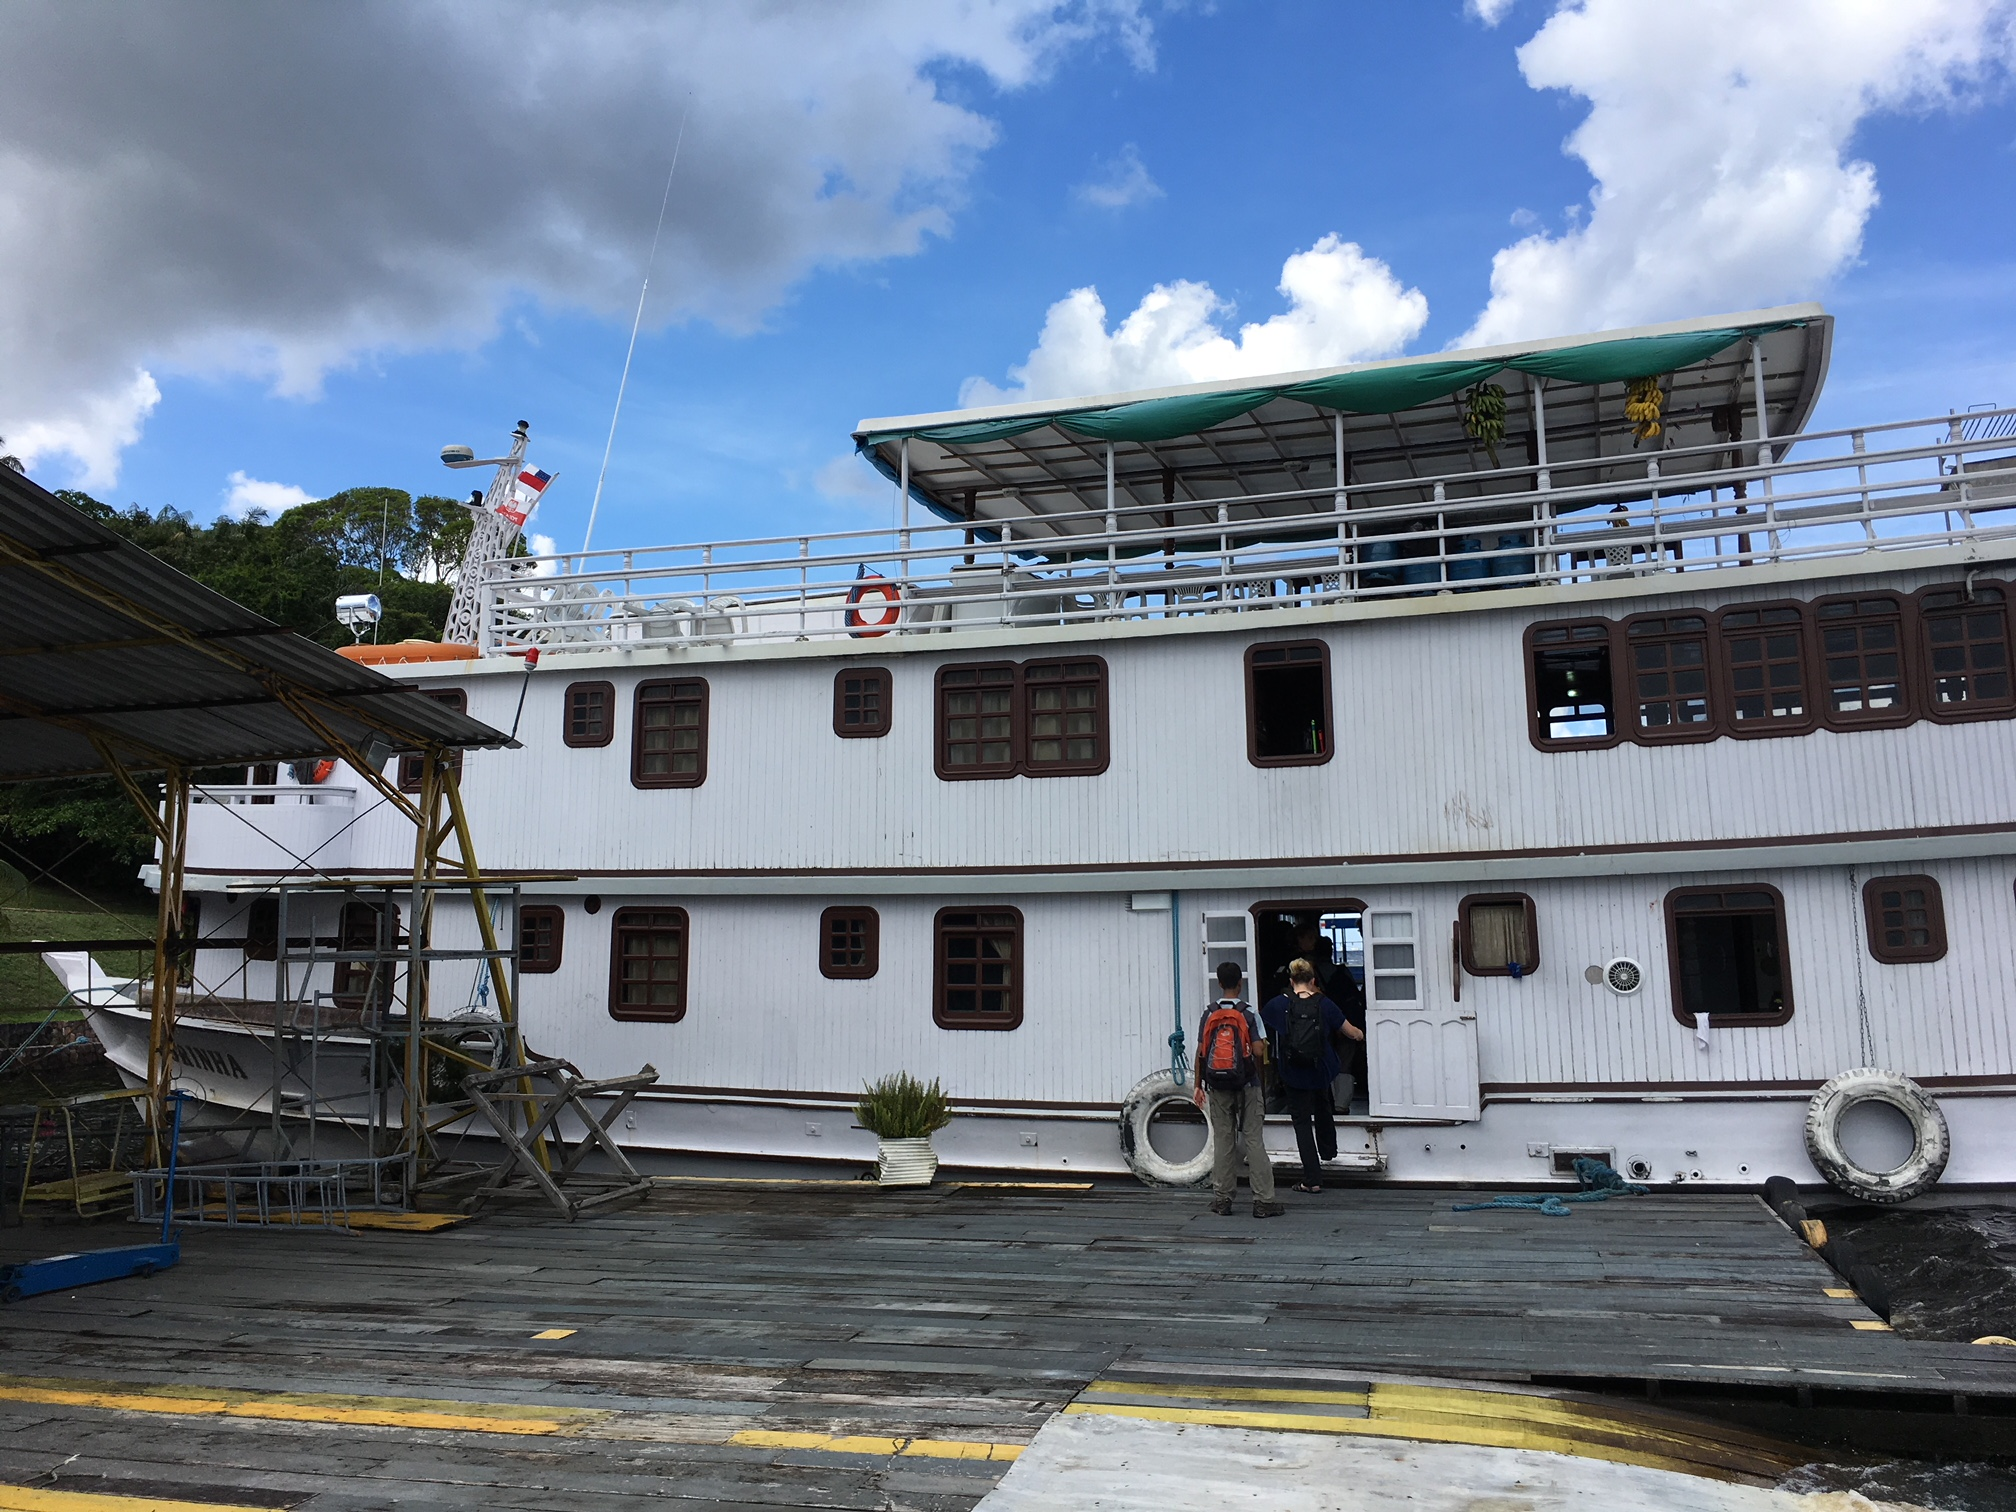 The Dorinha docked in Manaus